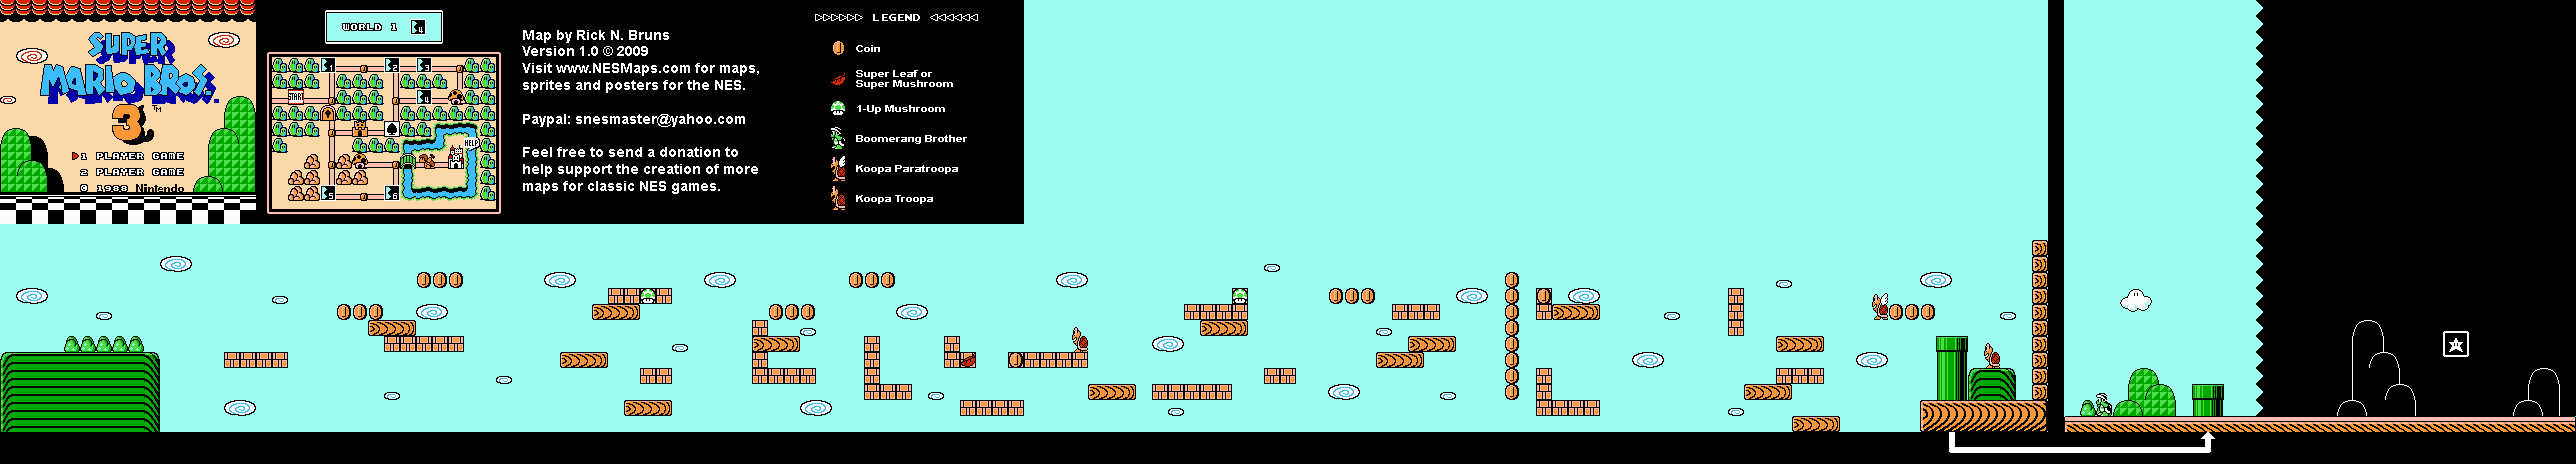 Super Mario Brothers 3 - World 1-4 Nintendo NES Map